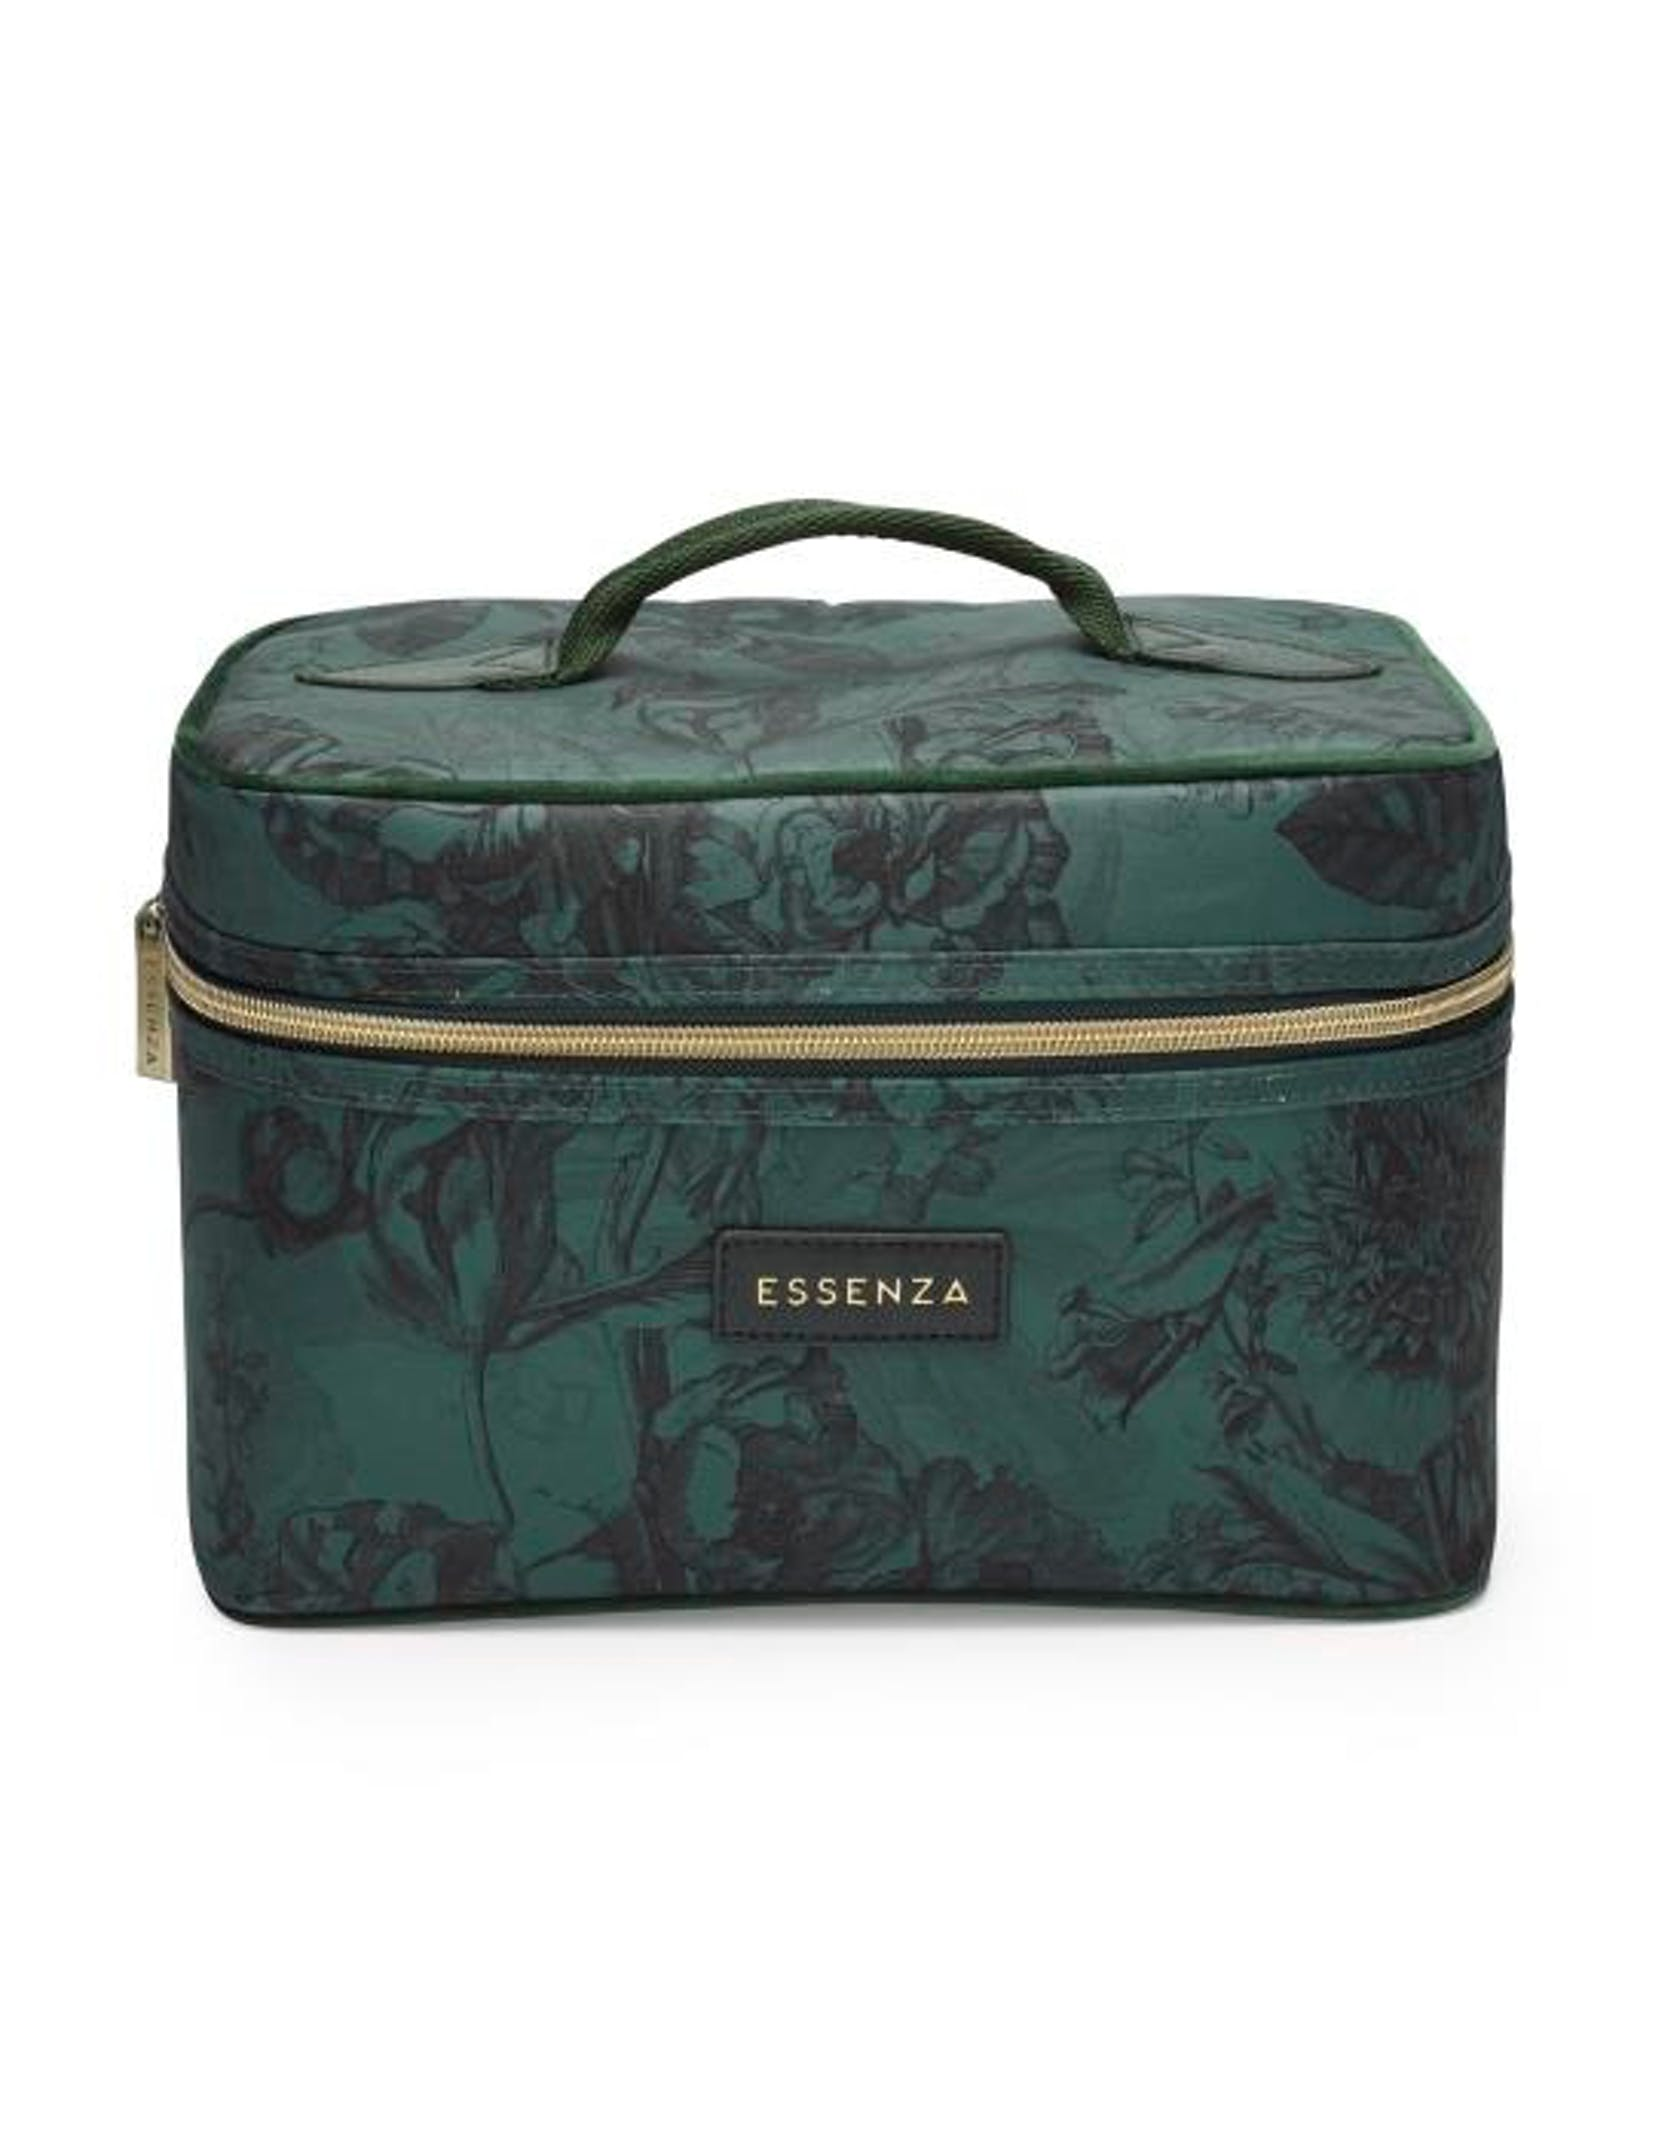 ESSENZA Tracy Vivienne Beauty Case Green